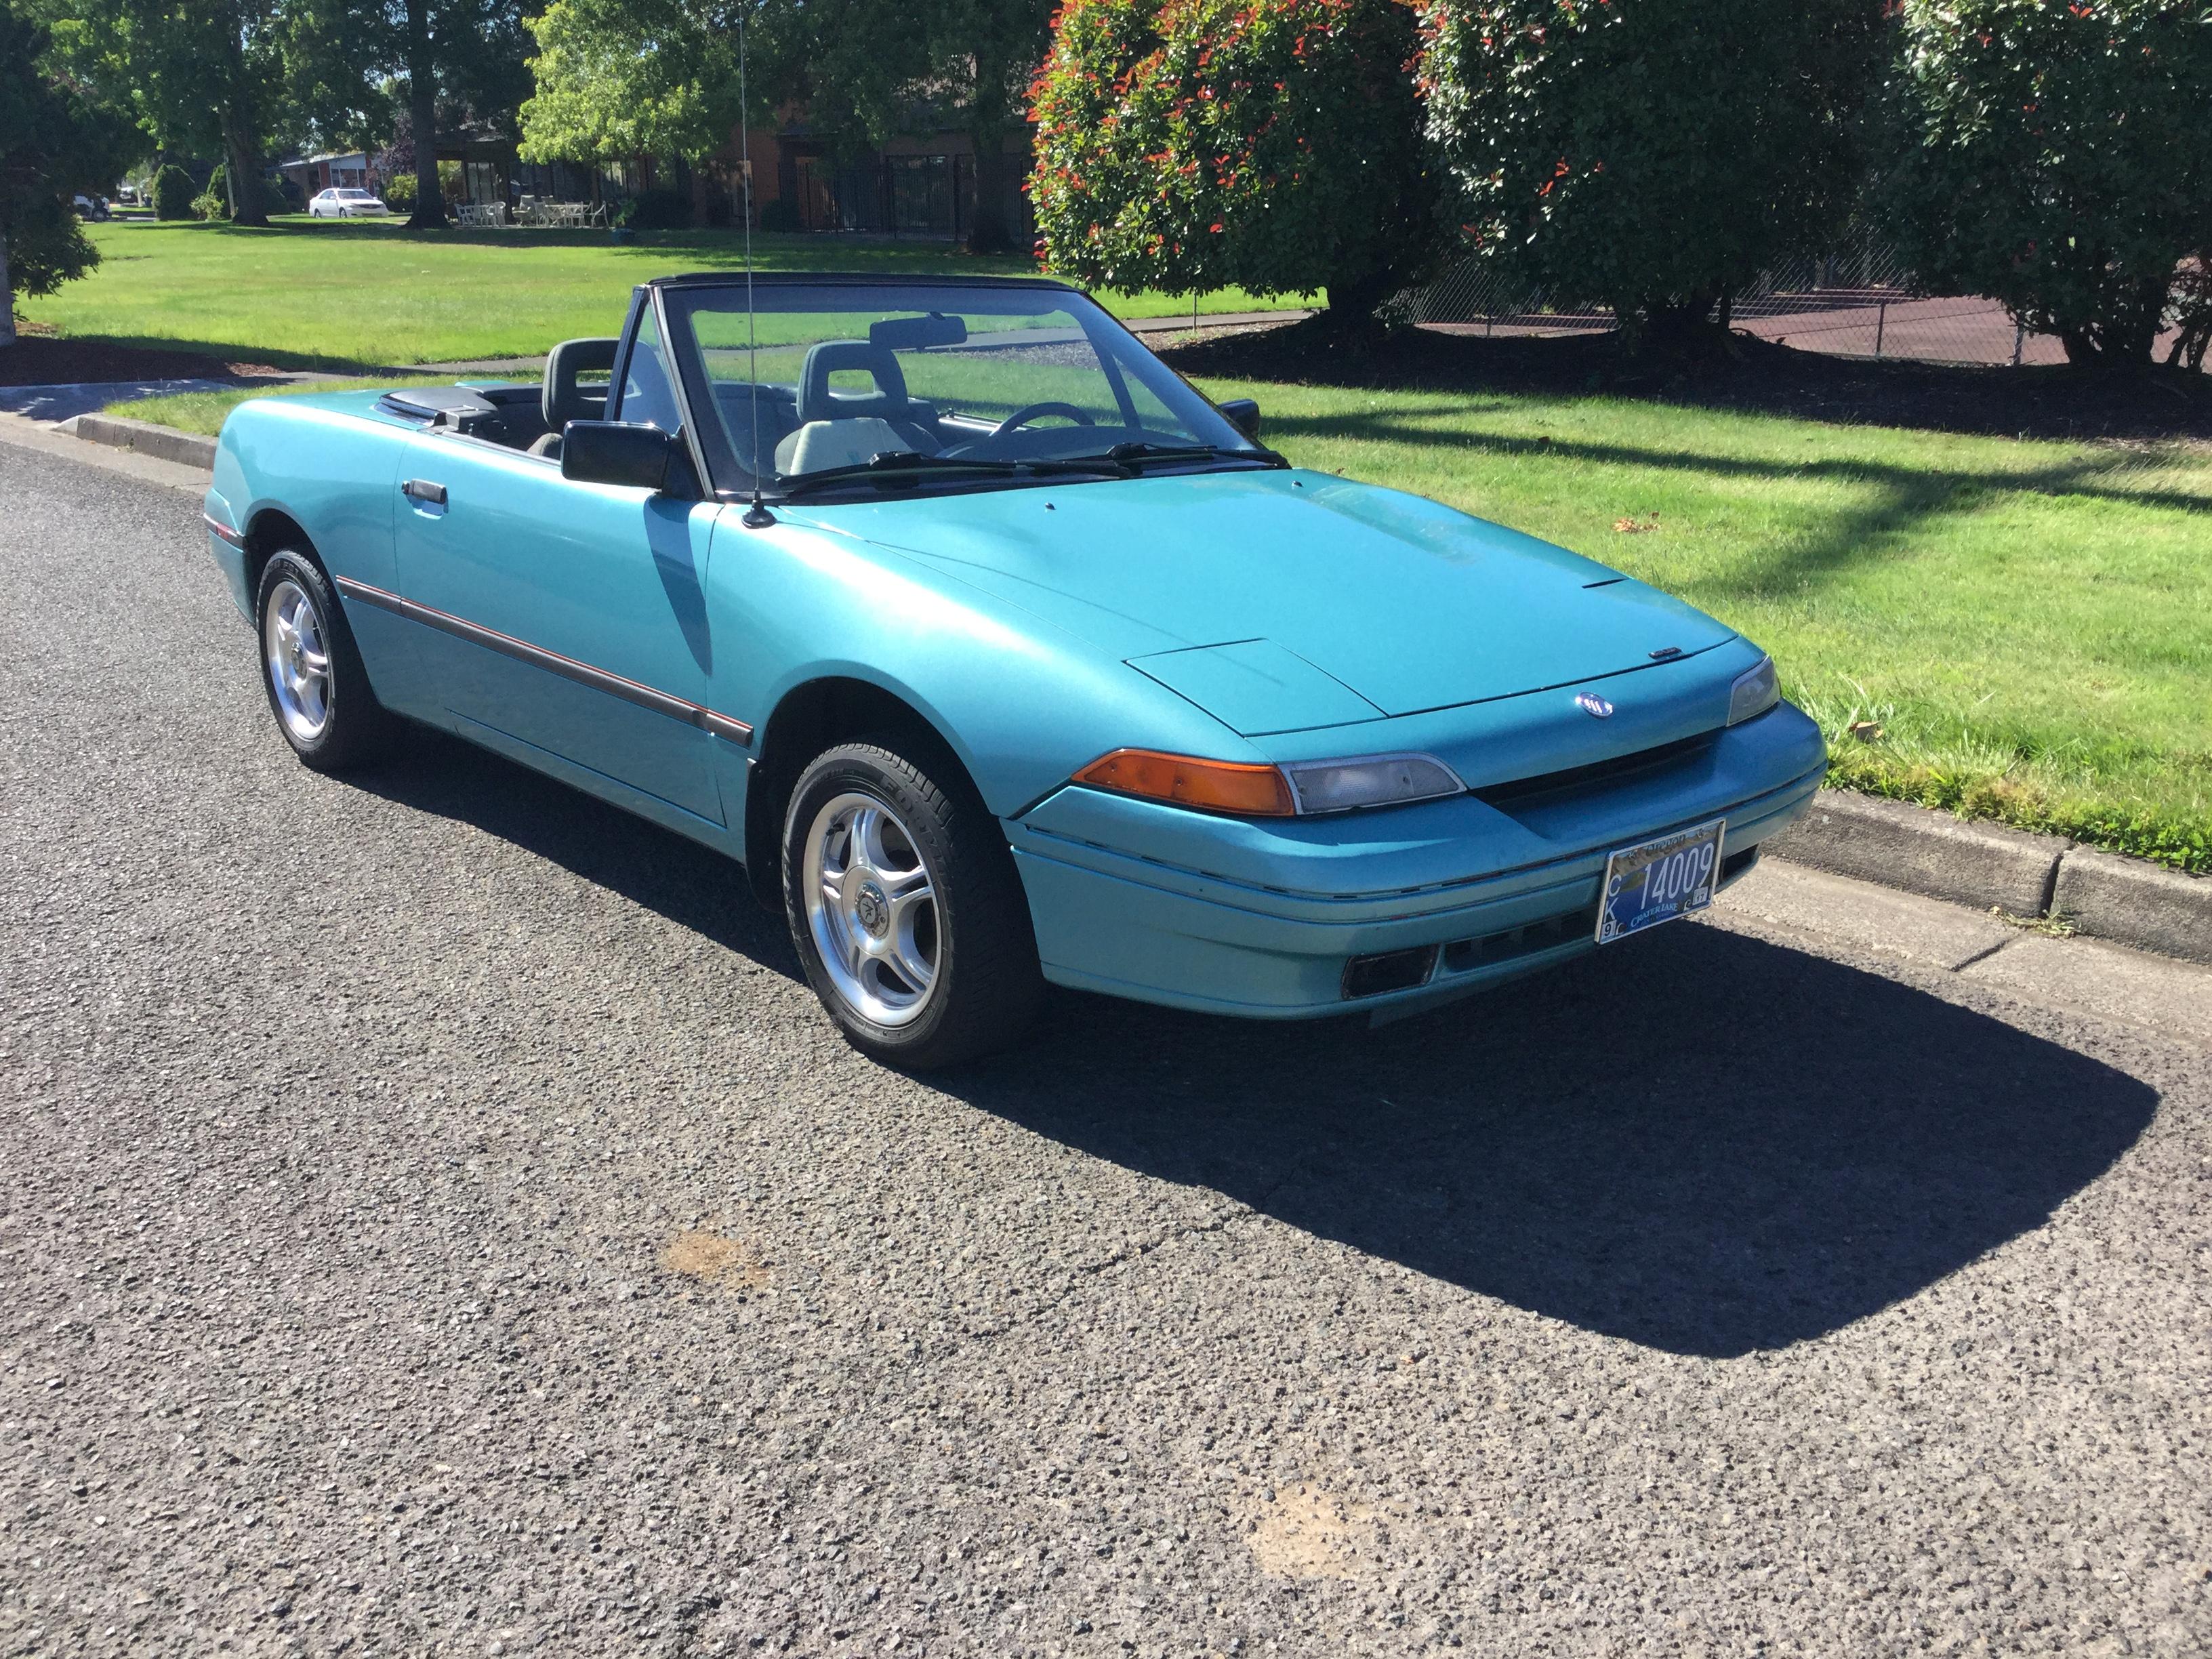 1991 Mercury Capri Convertible Turquoise